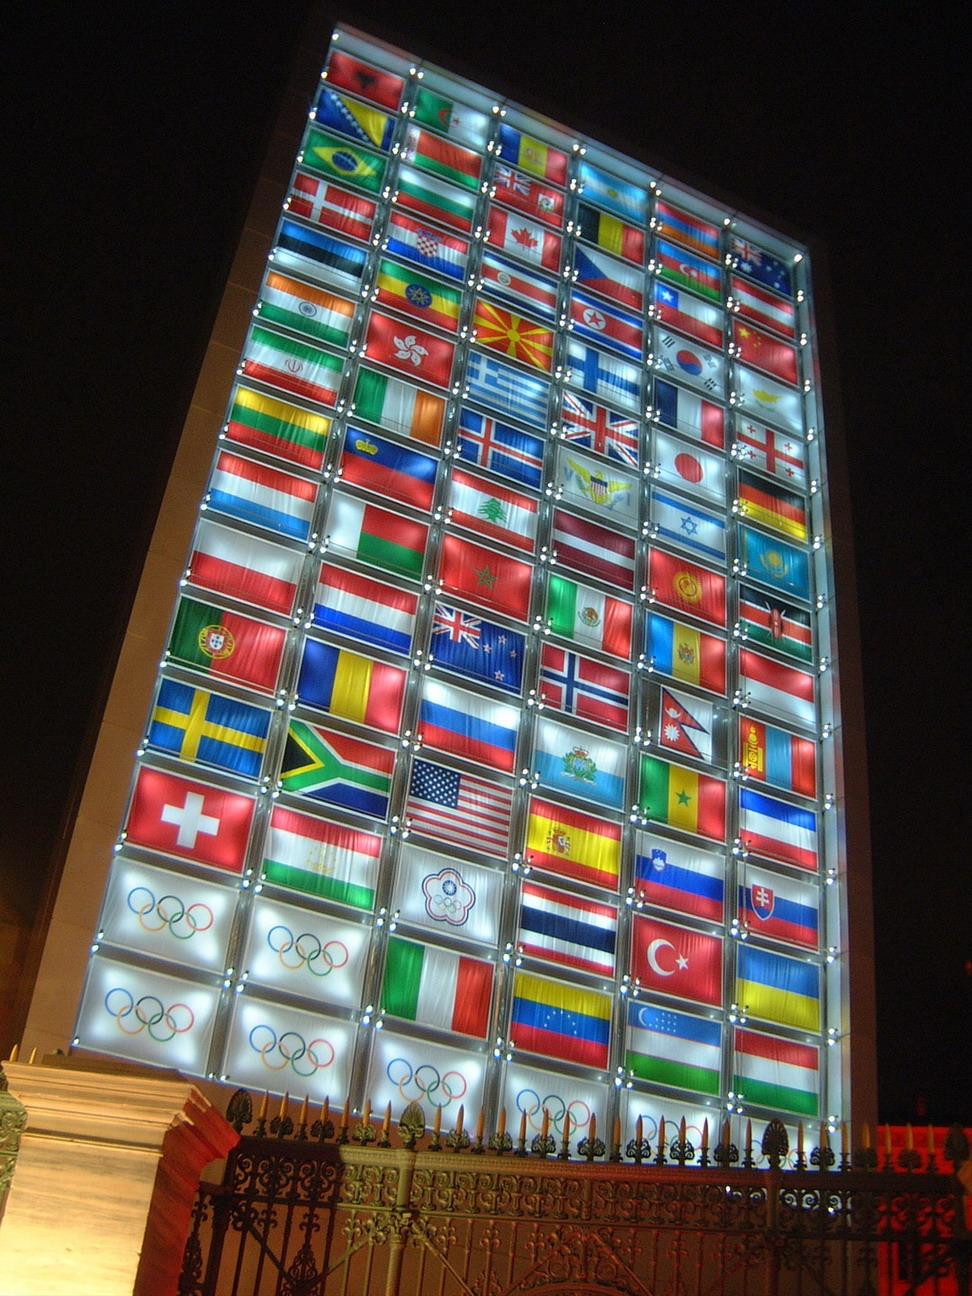 2006 Winter Olympics Torino Medal Plaza